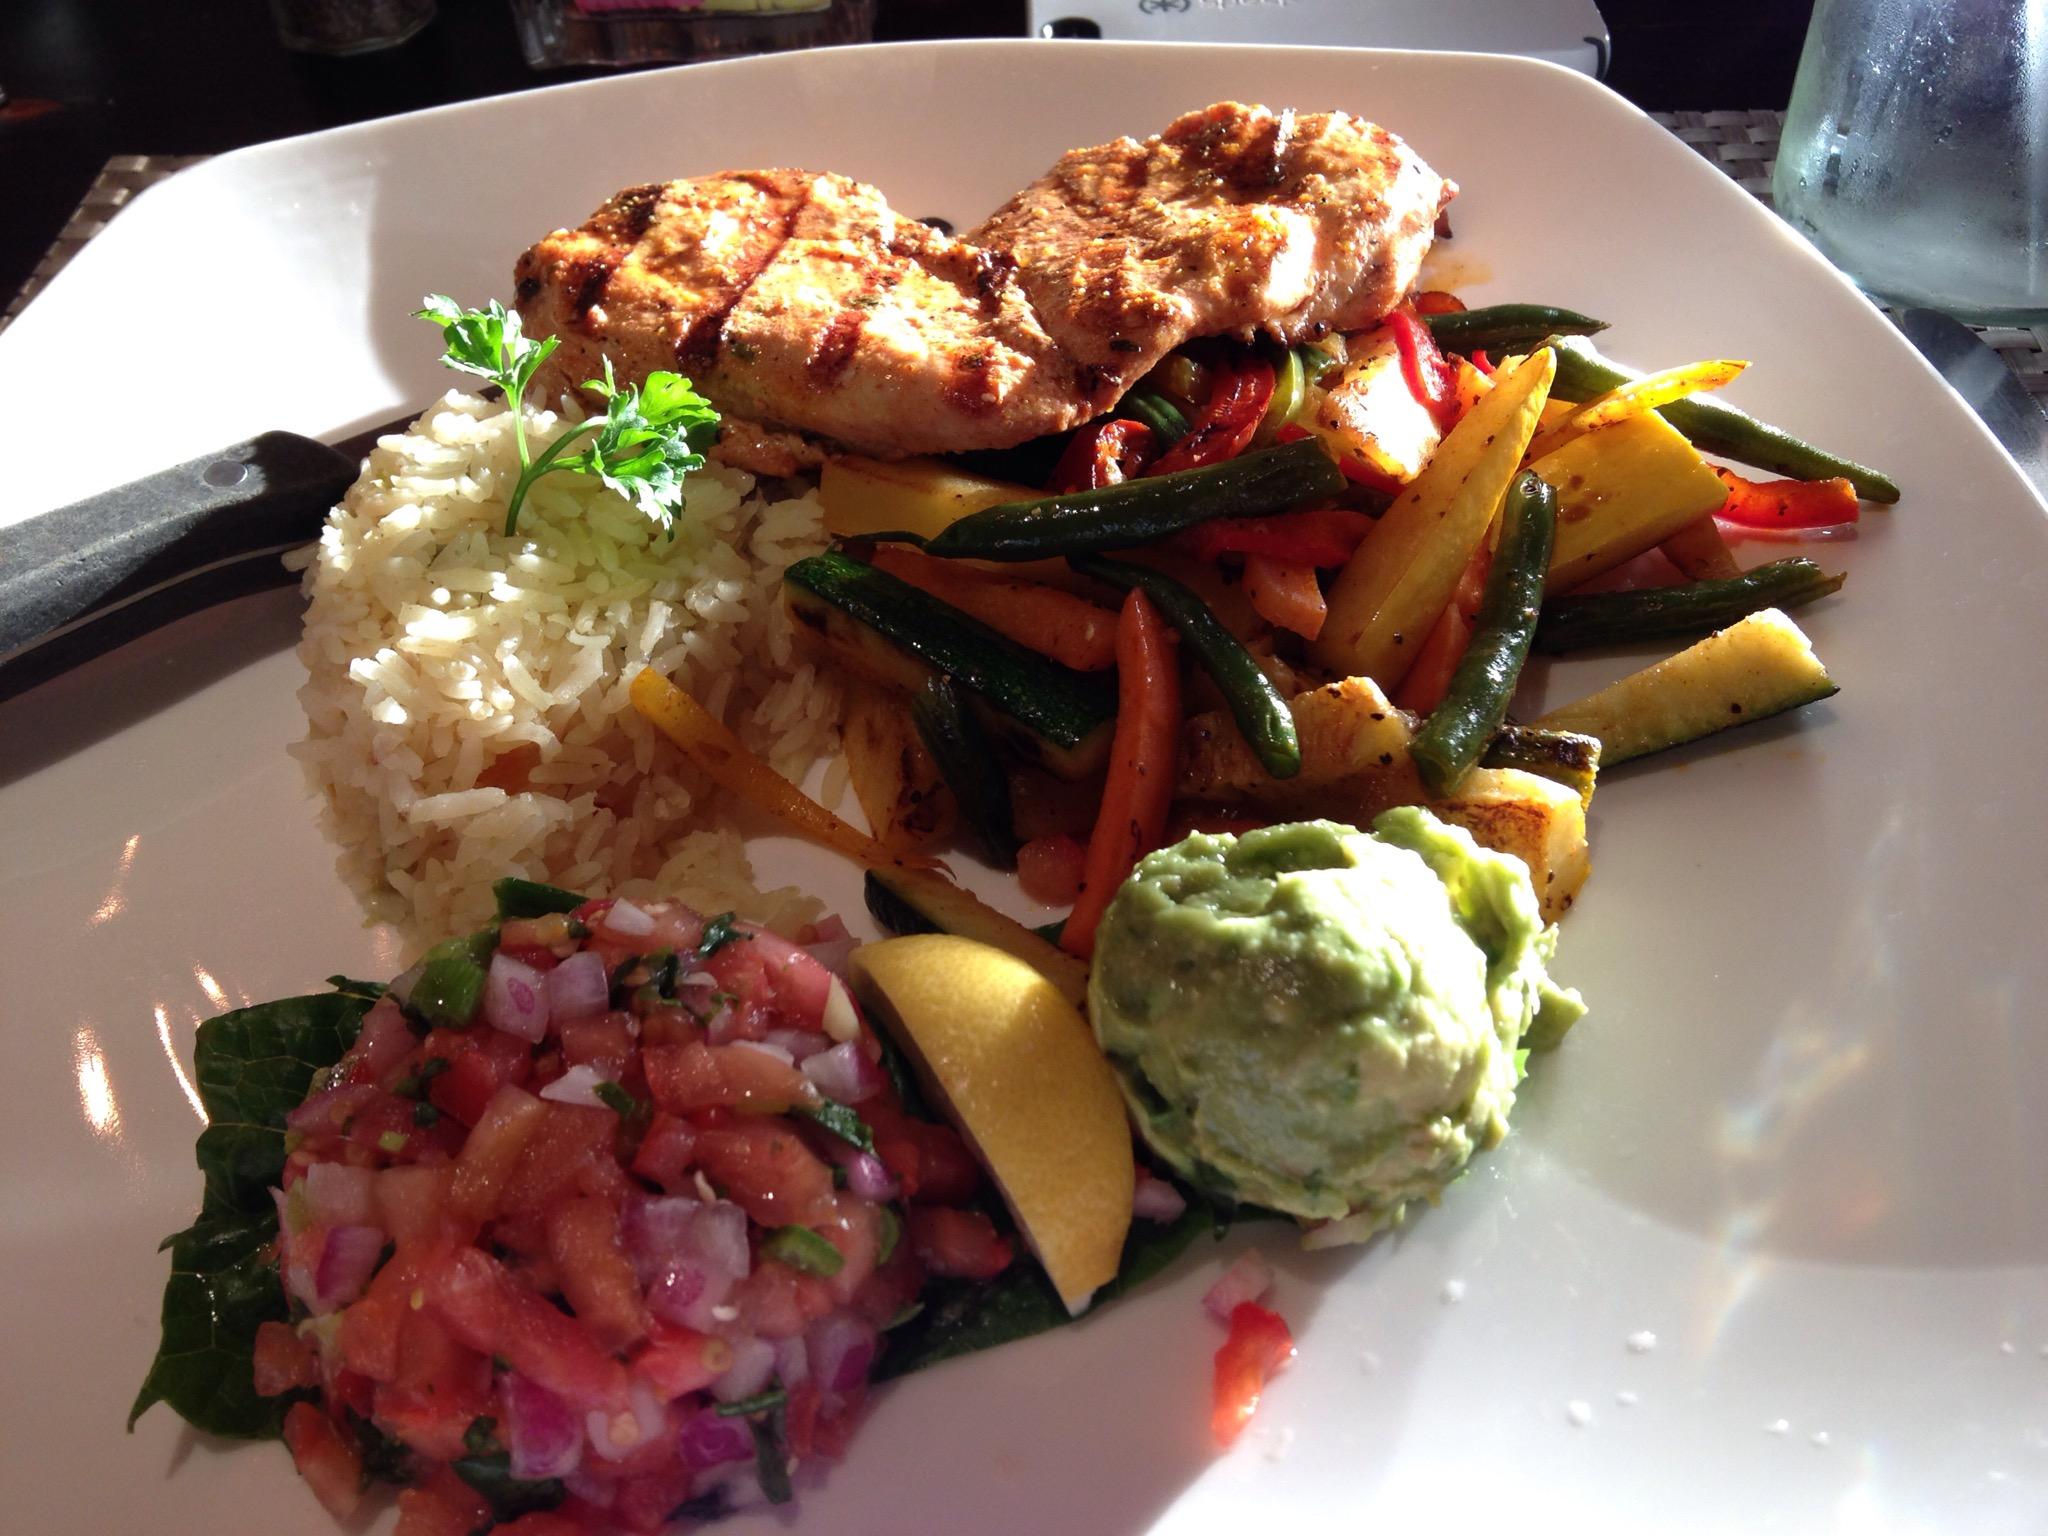 187 Mena S Healthy Plate Dine At Joe S